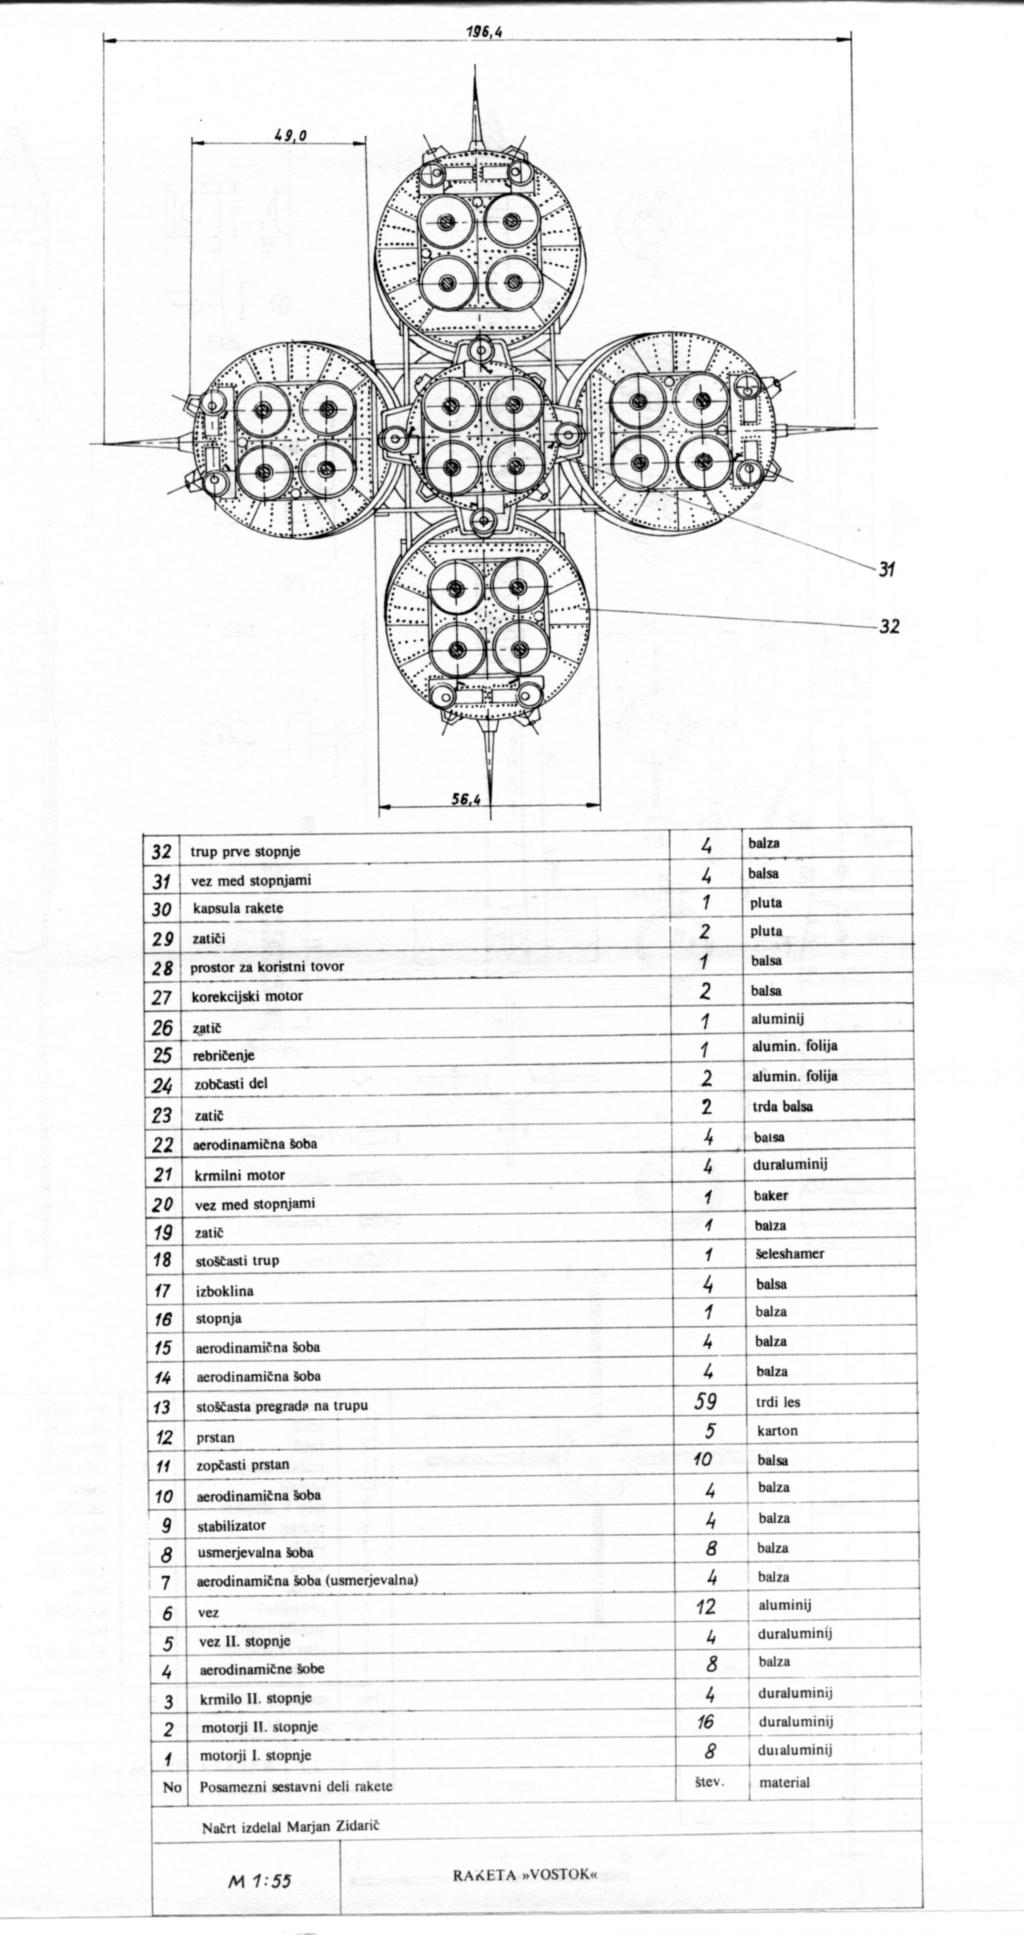 Vostok R7 Vostok14